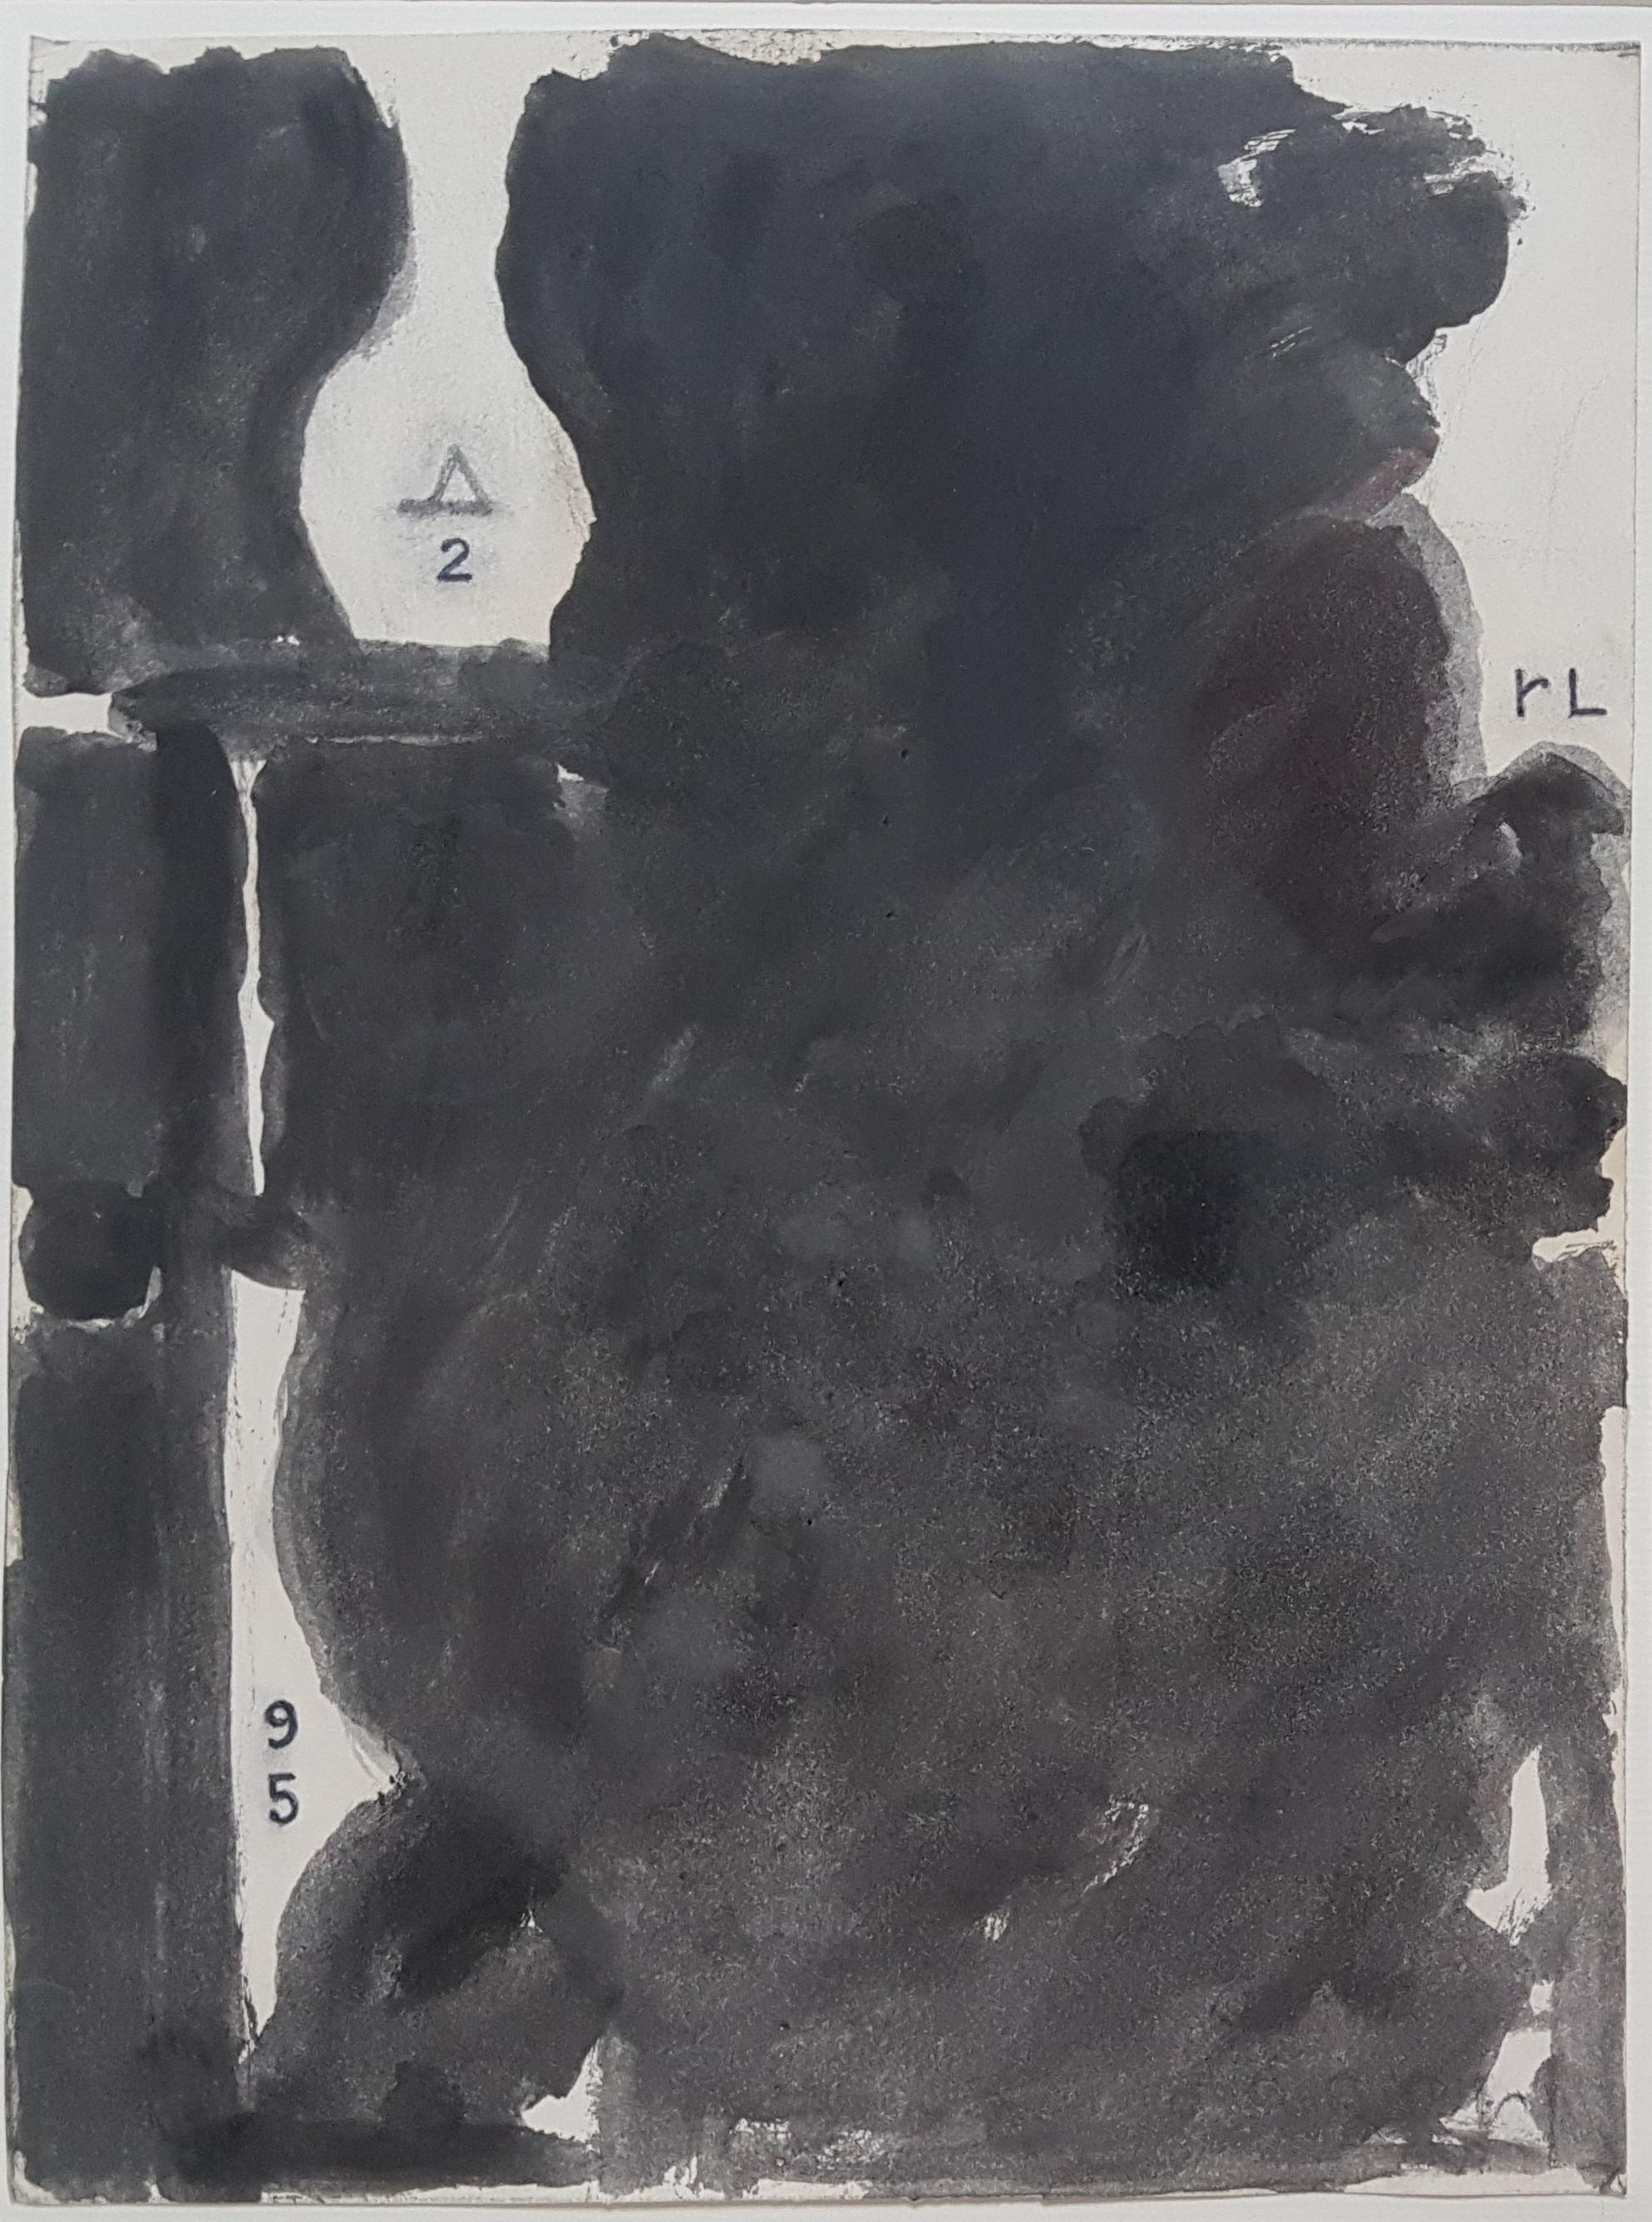 ^2 (1995)